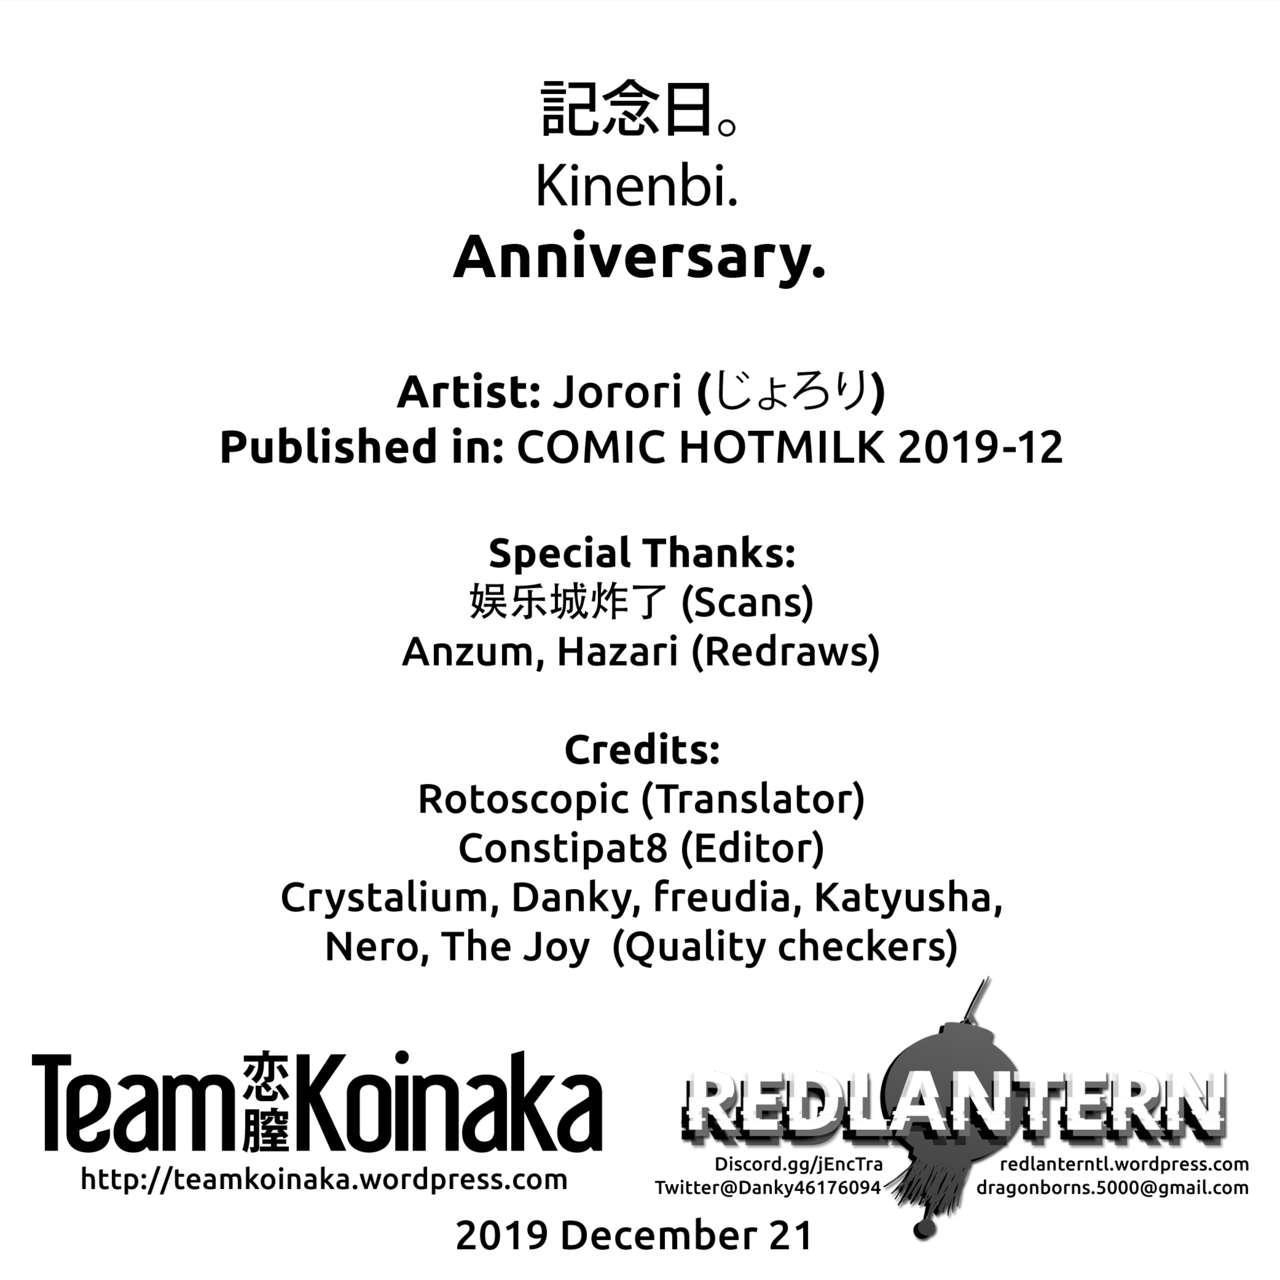 Kinenbi. | Anniversary. 27